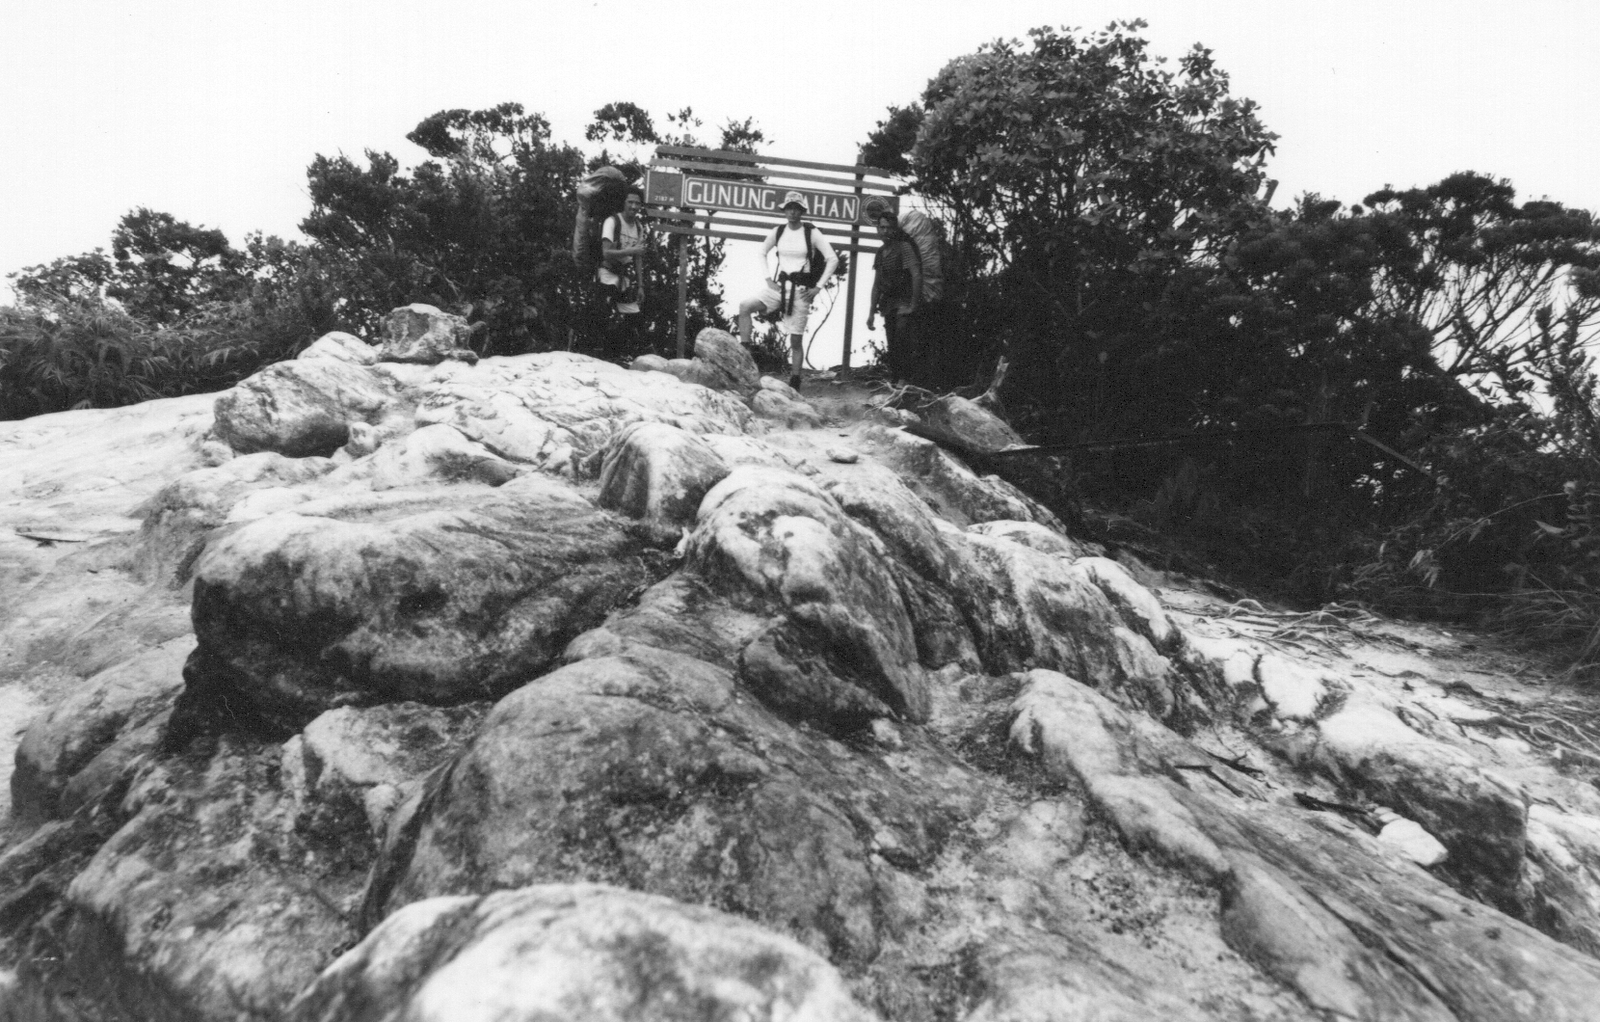 Lin Yangchen on the summit of Gunung Tahan